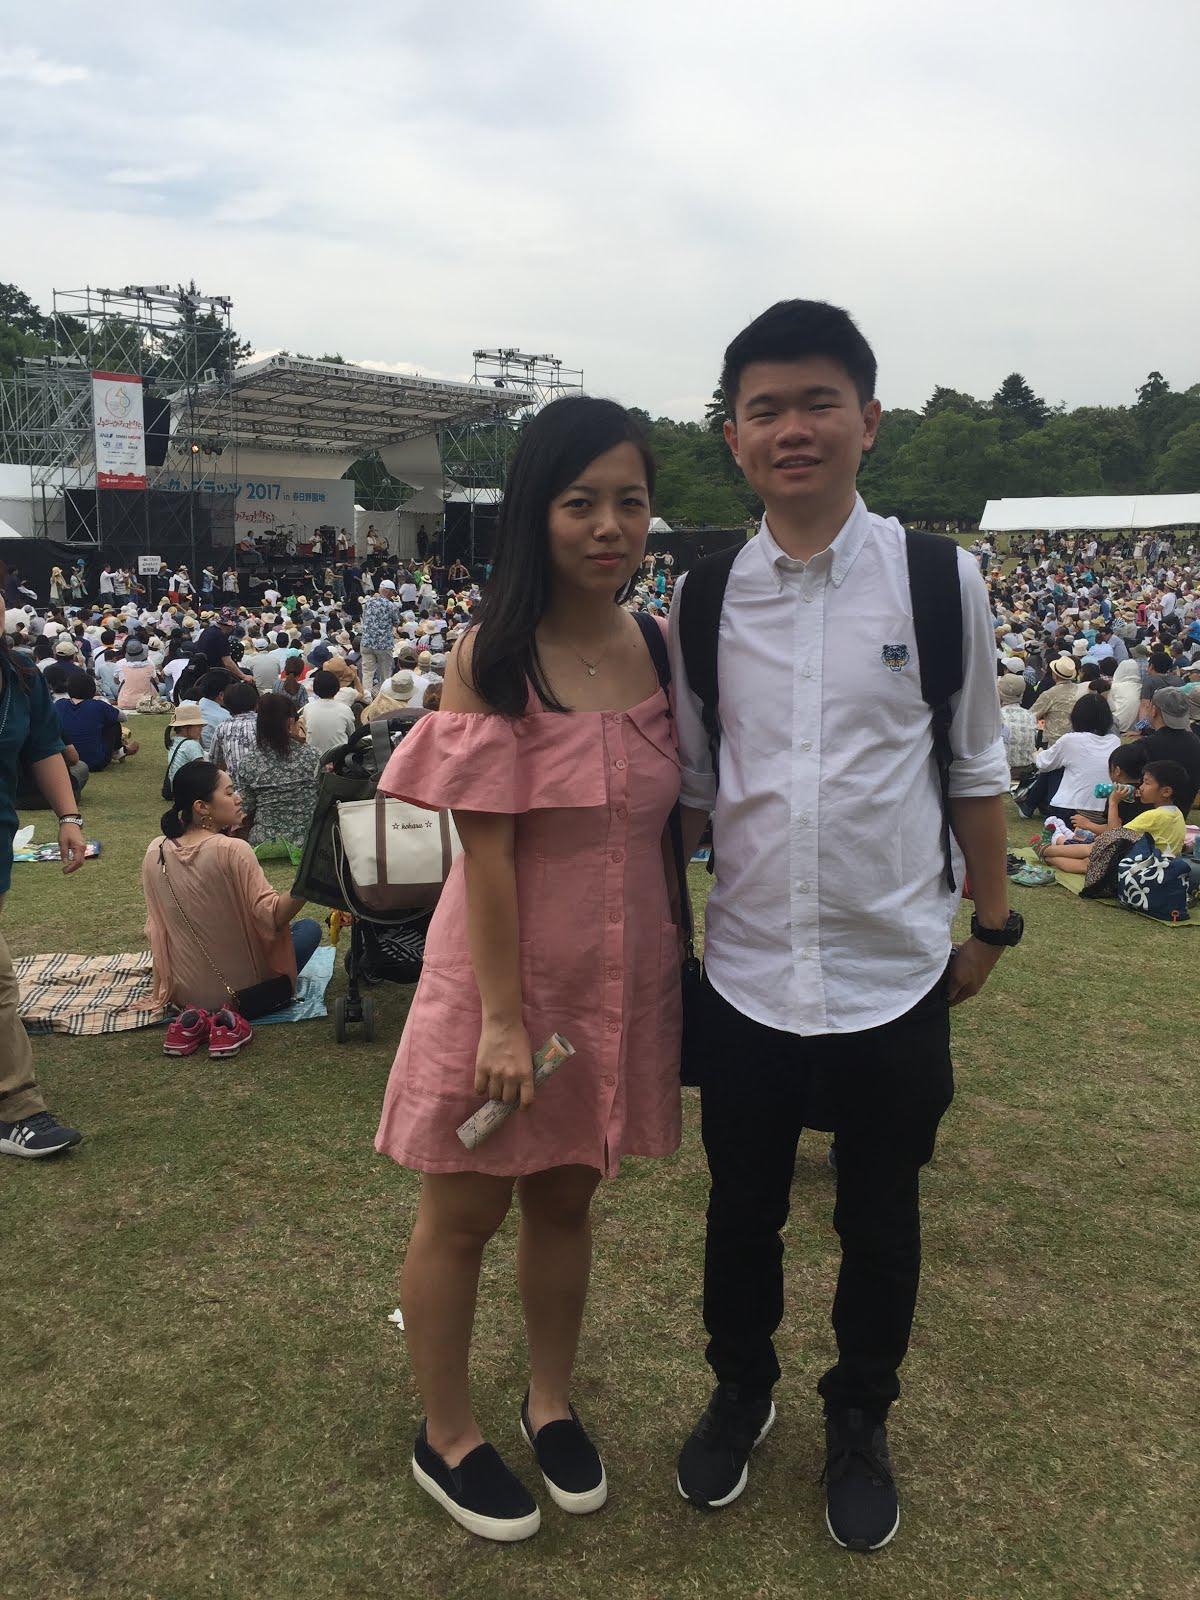 MUSIC FESTIVAL IN NARA OSAKA JAPAN